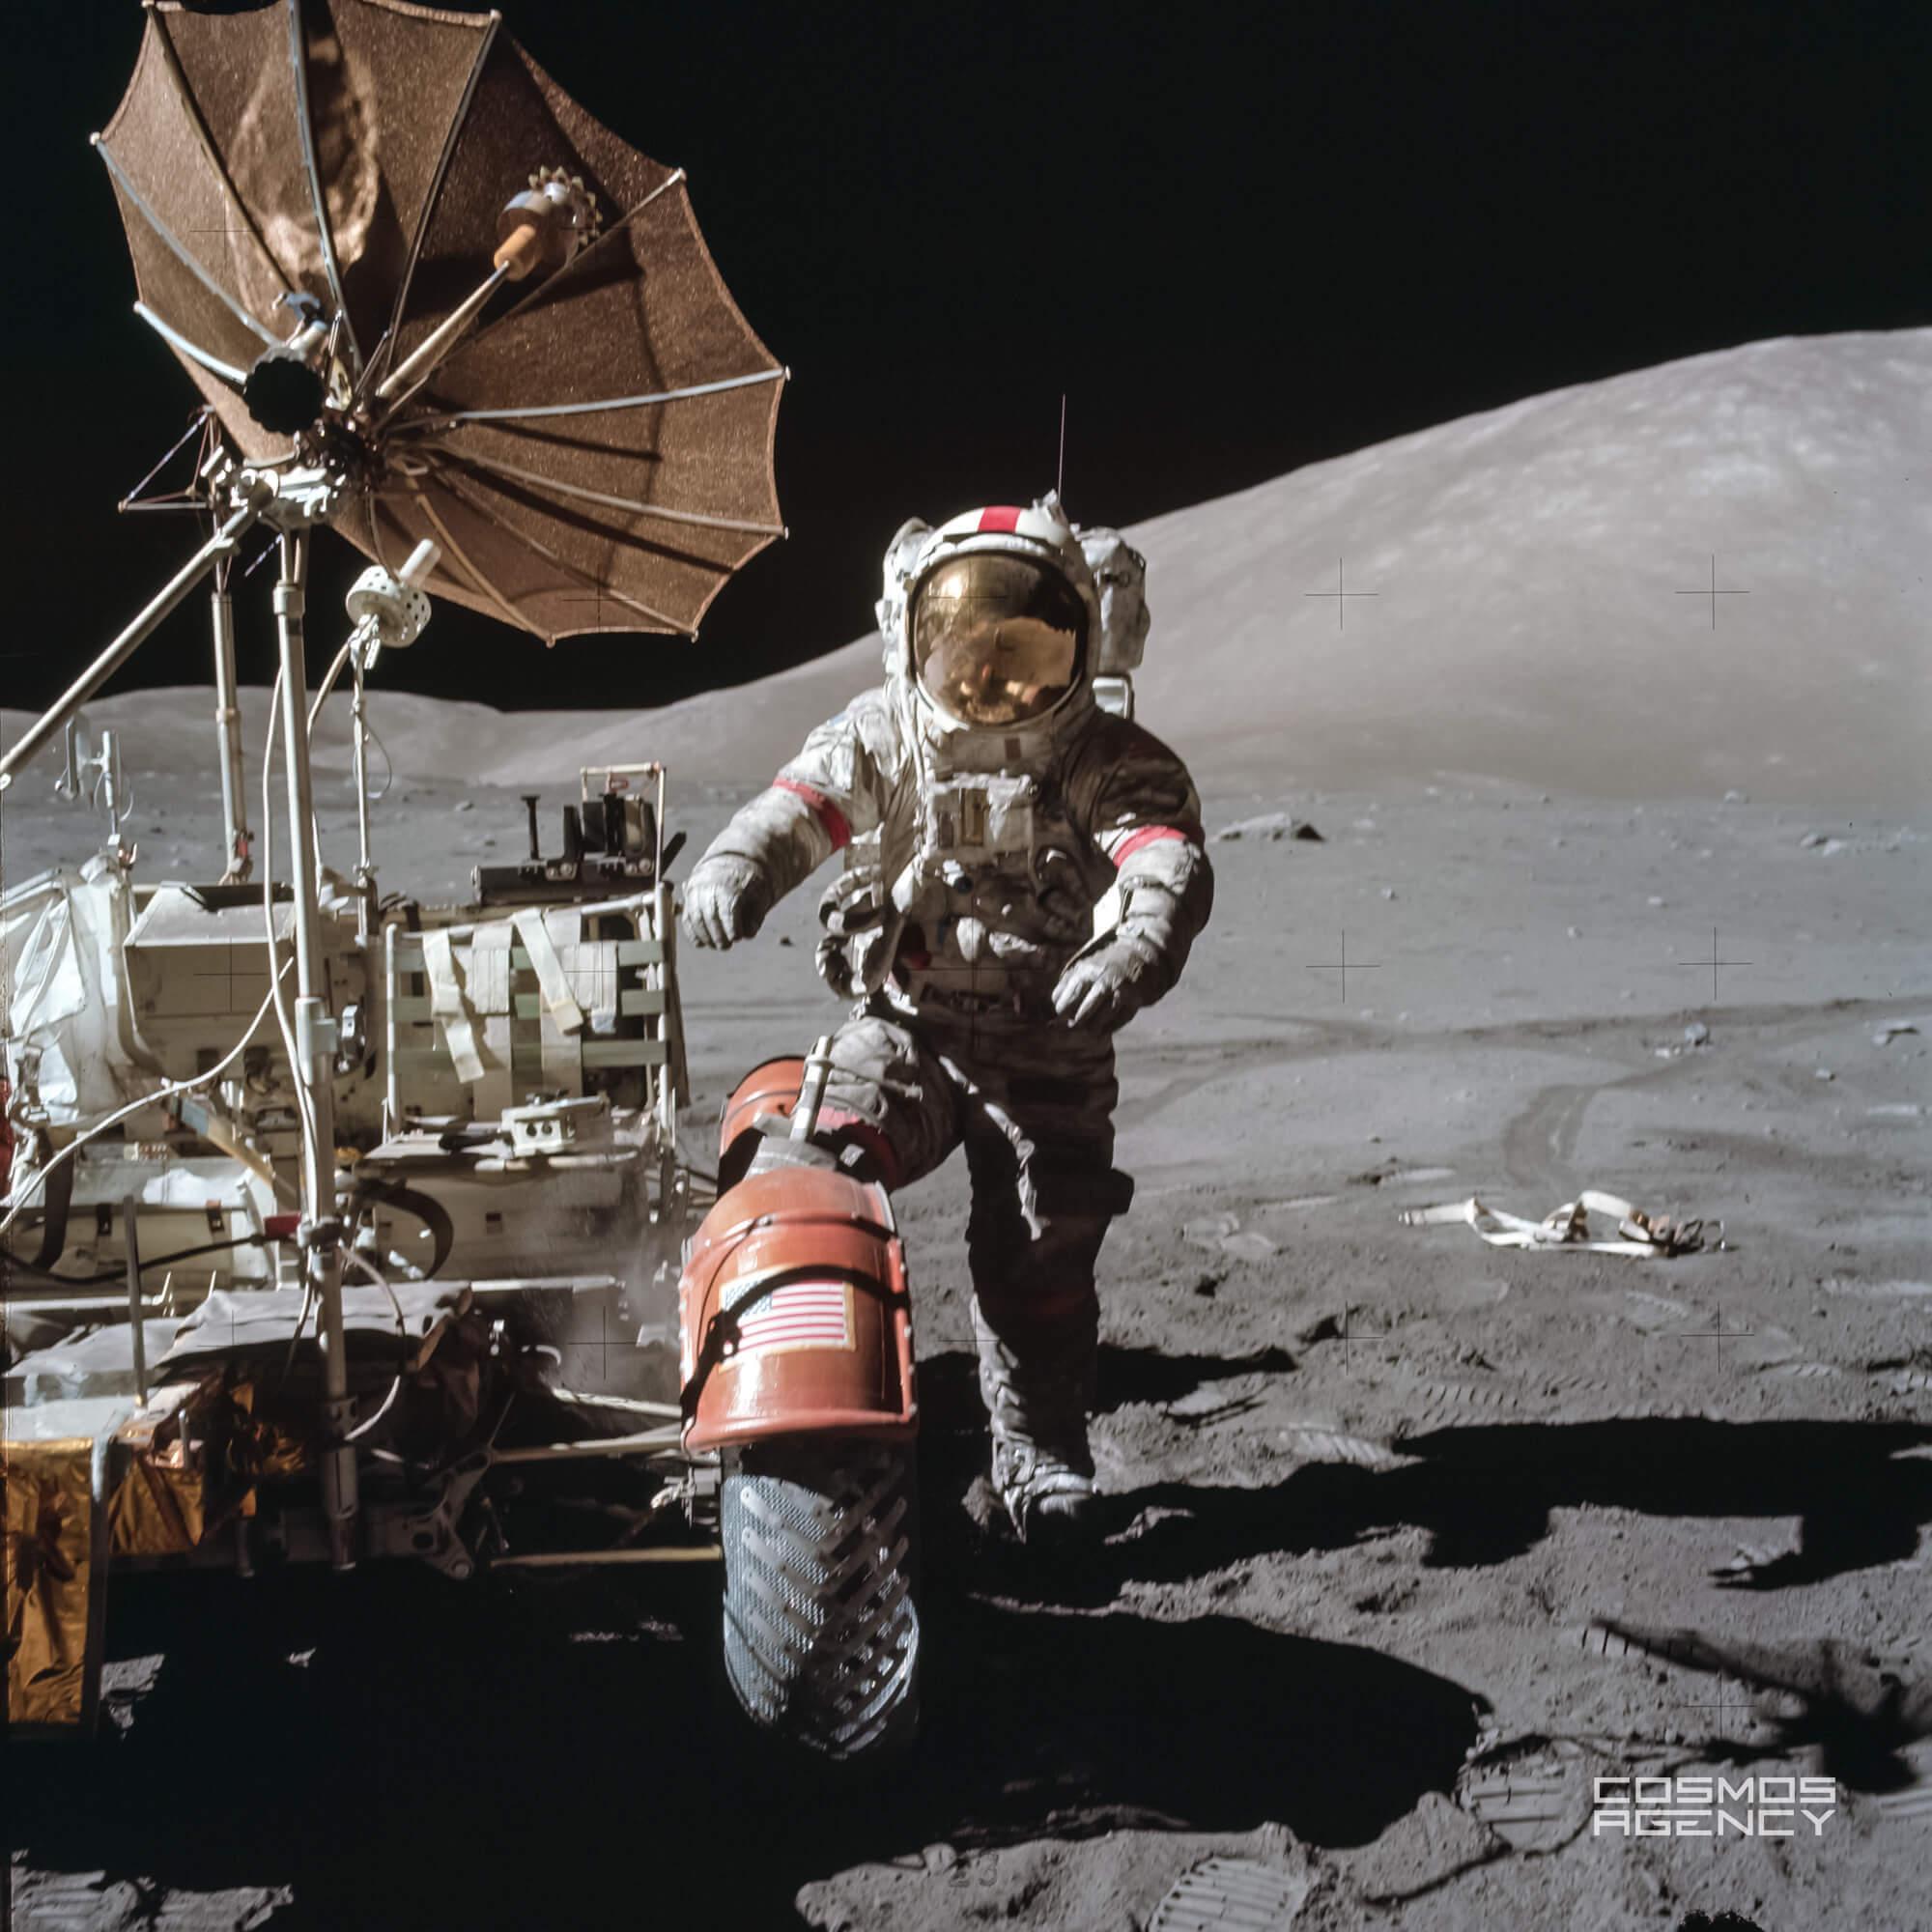 Астронавт NASA Юджин Сернан около Лунного ровера, Аполлон 17, 1972